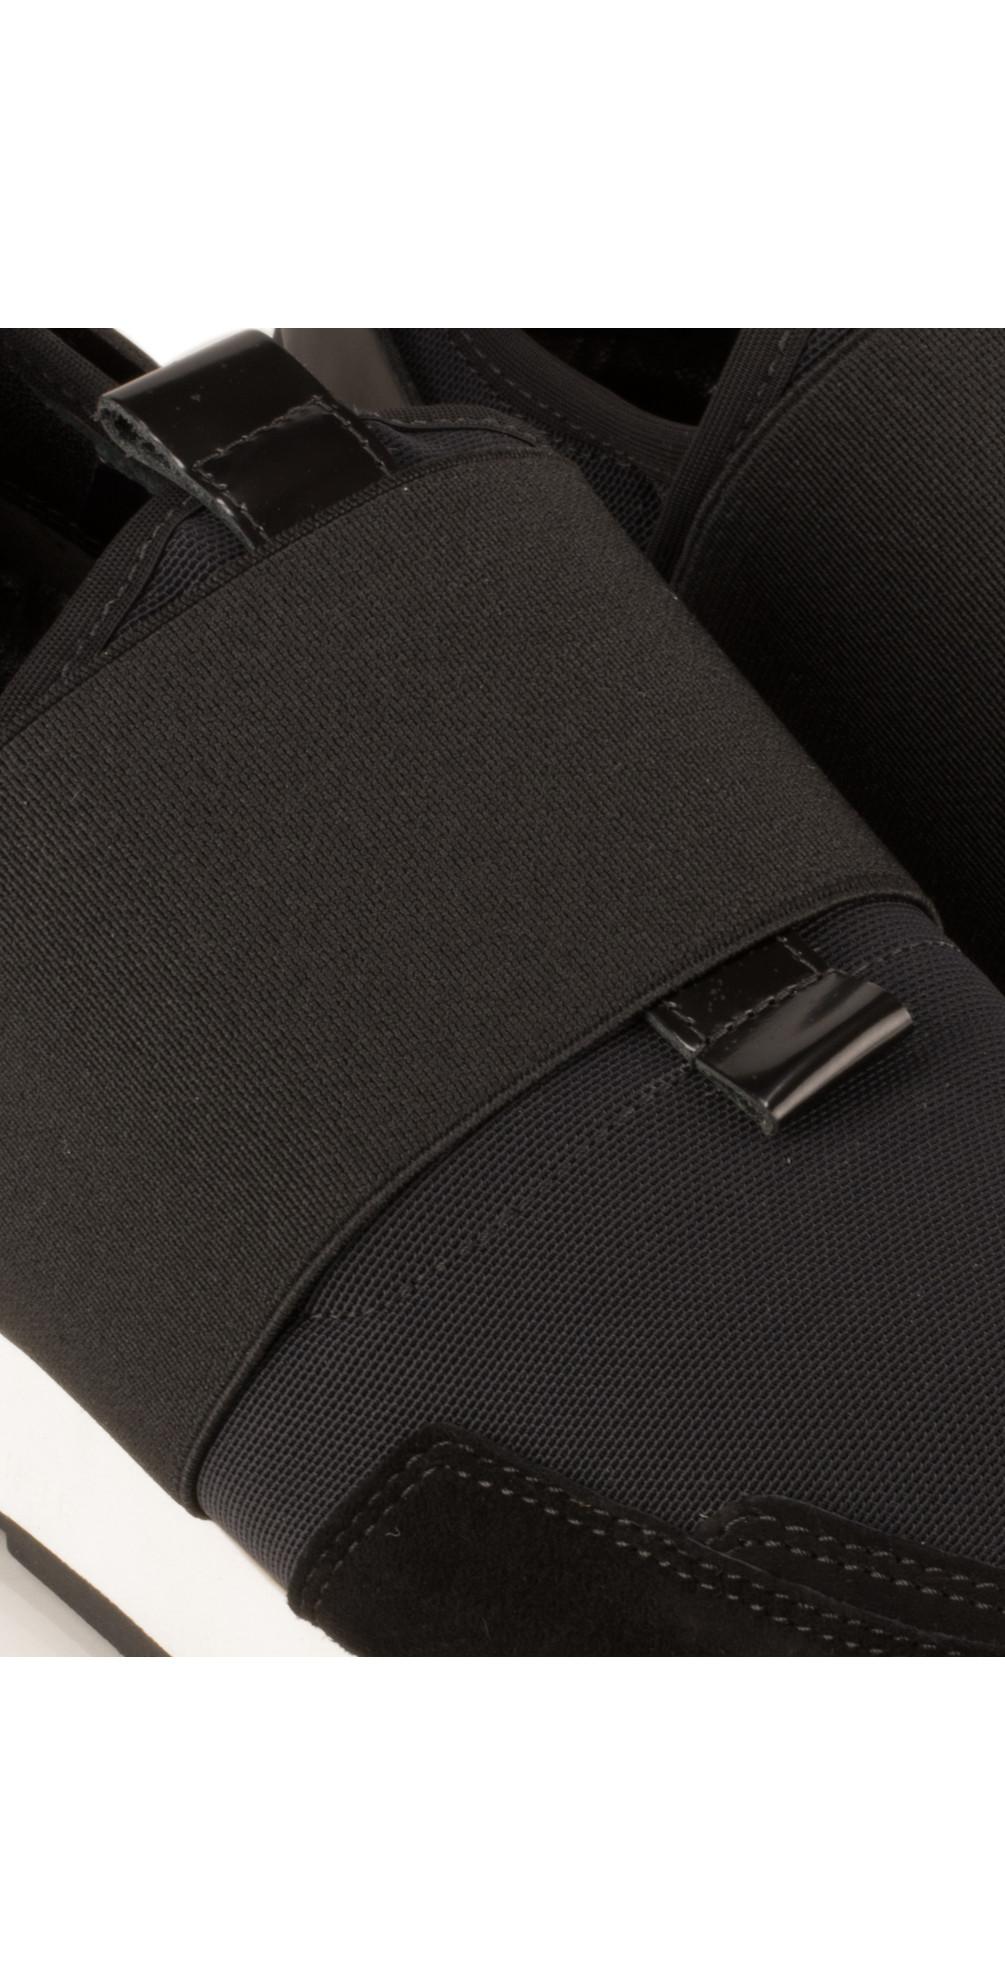 kennel und schmenger racer trainer shoe in schwarz. Black Bedroom Furniture Sets. Home Design Ideas